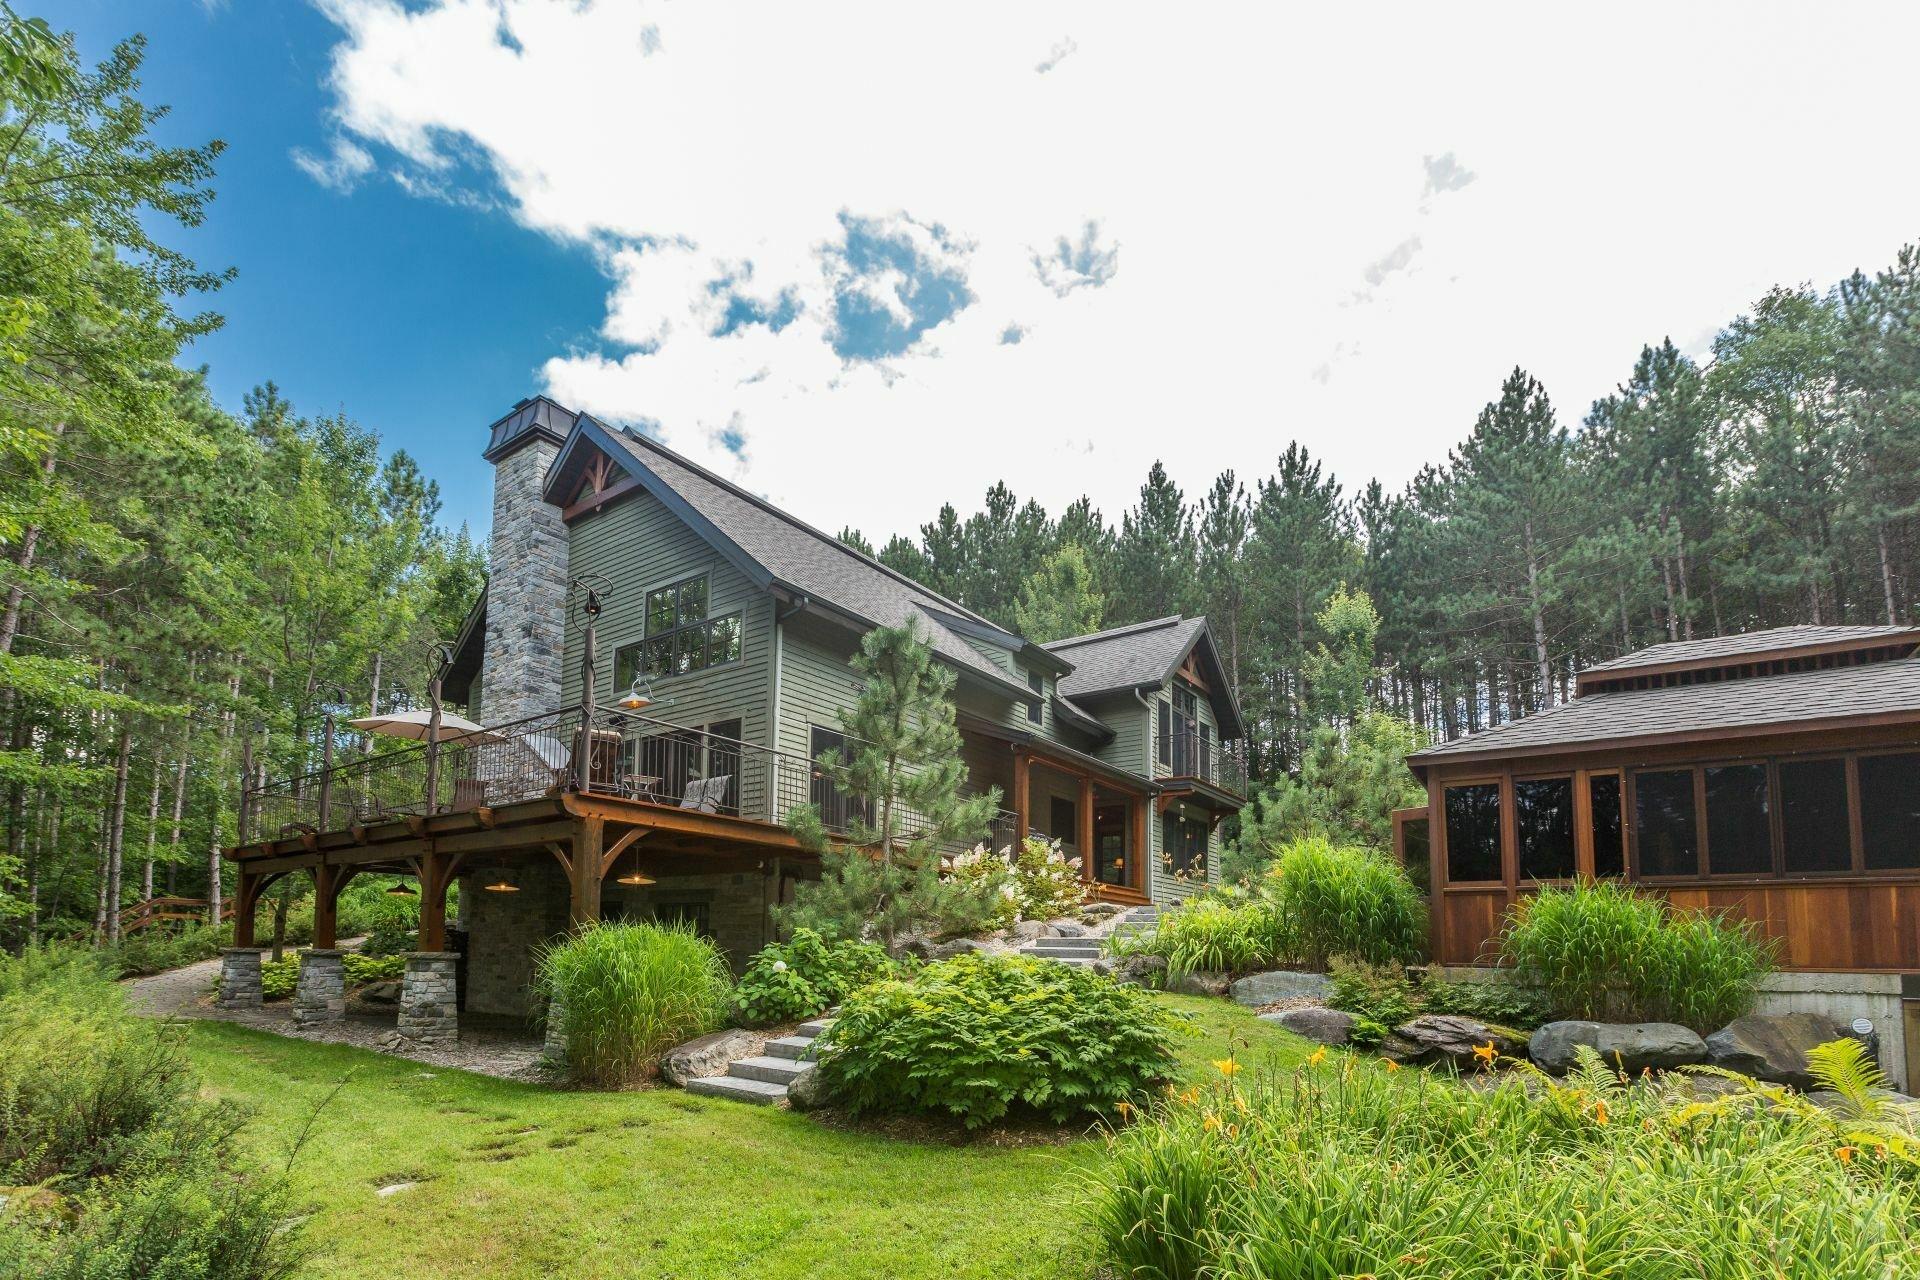 House in Shefford, Quebec, Quebec, Canada 1